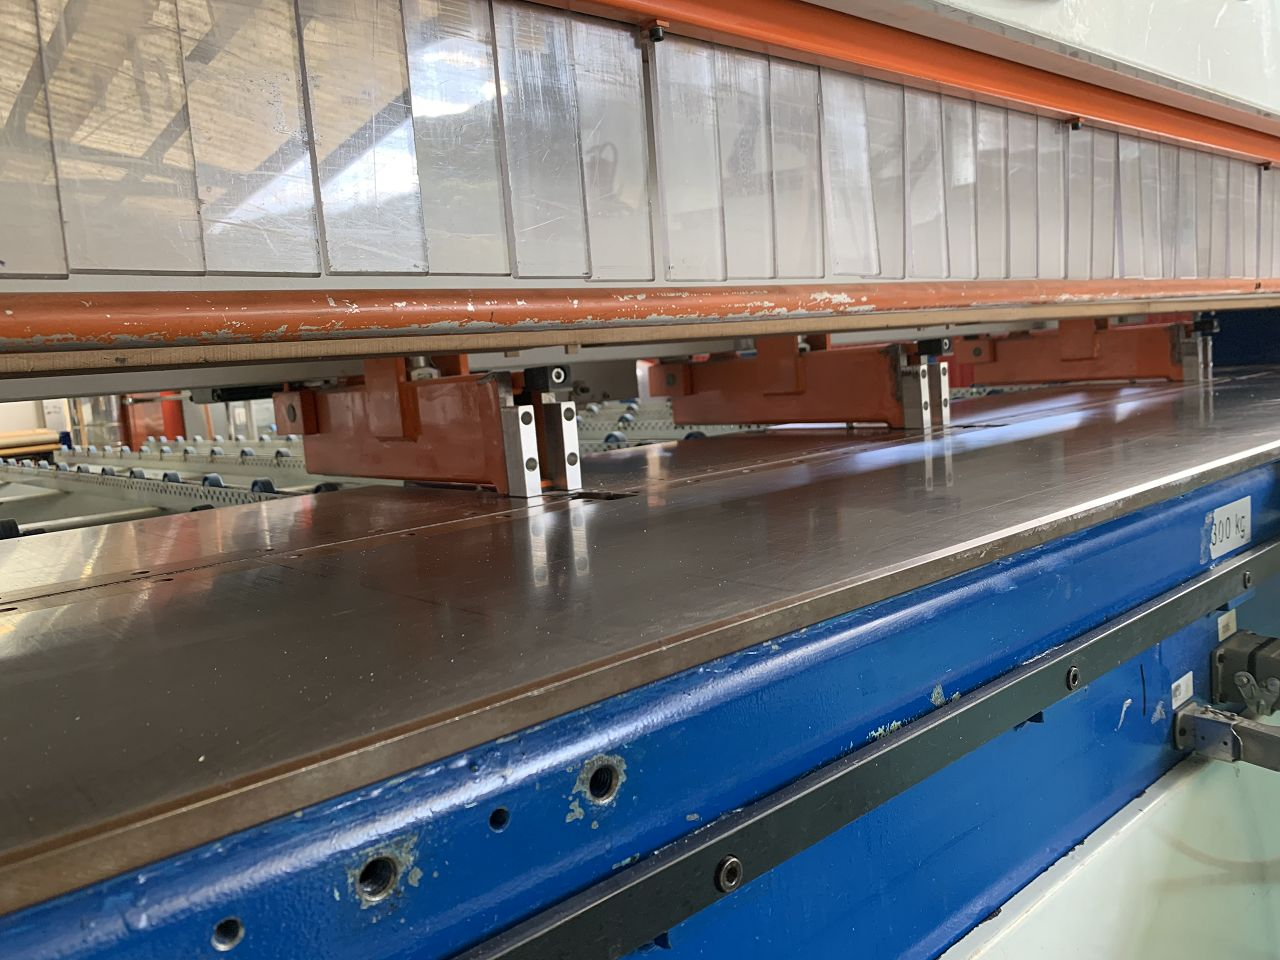 Plattensaege FM 330 330 Schelling  5 .JPGPlattensaege FM 330 330 Schelling  5